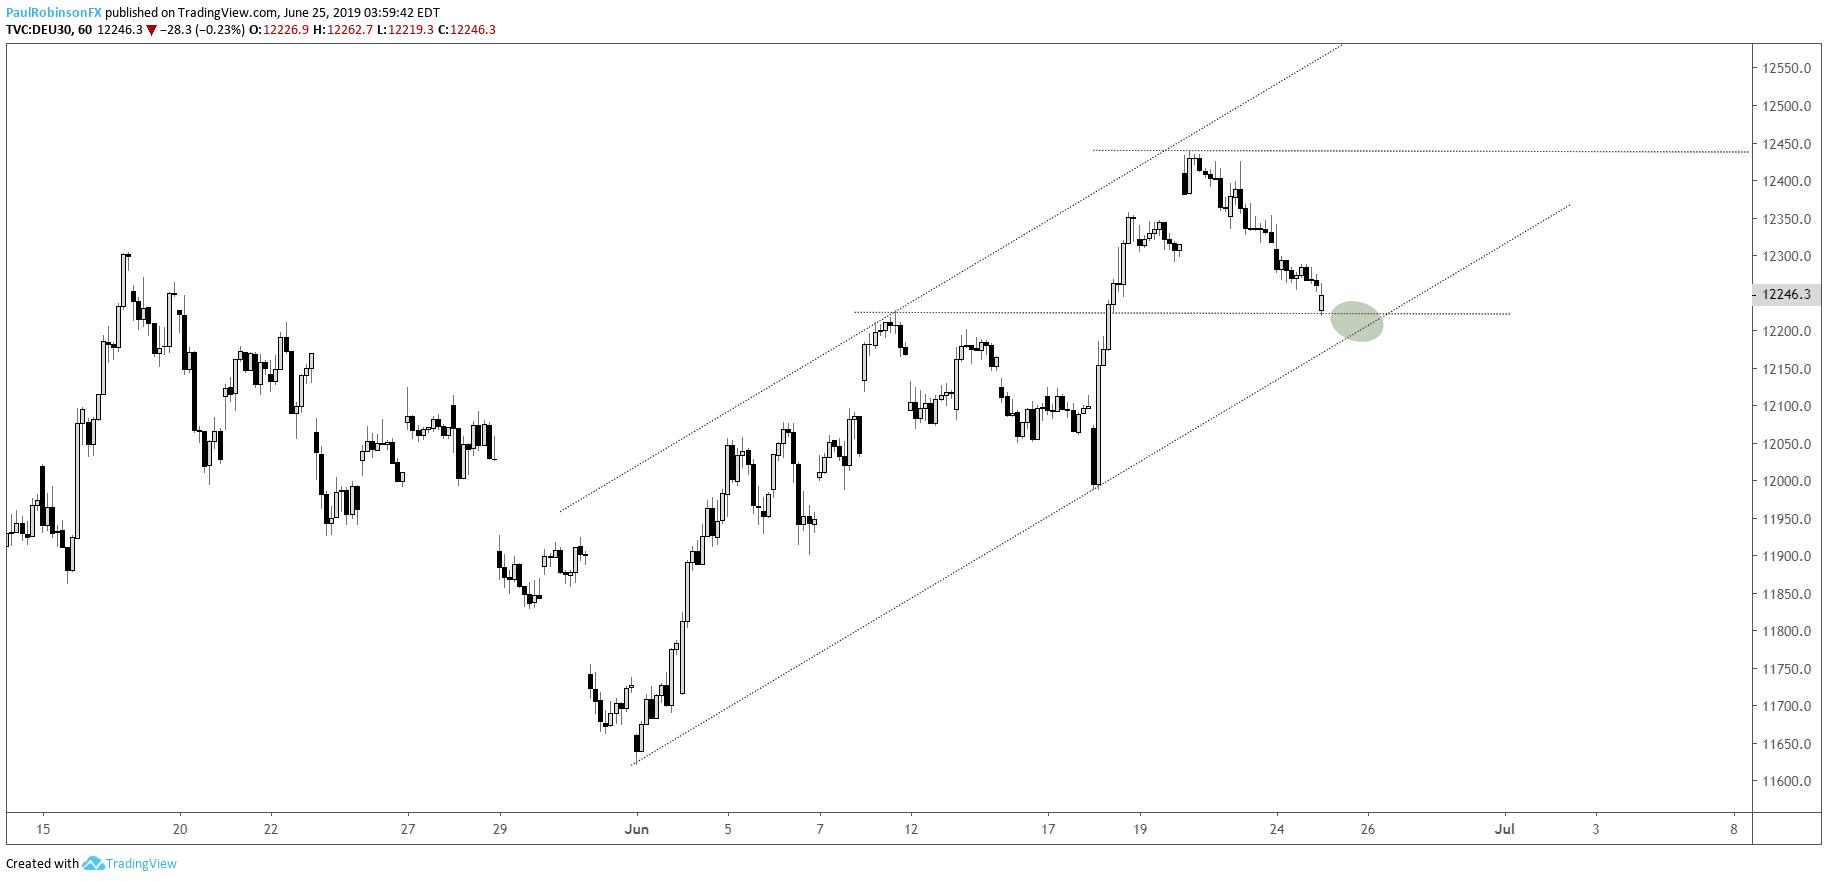 dax 30